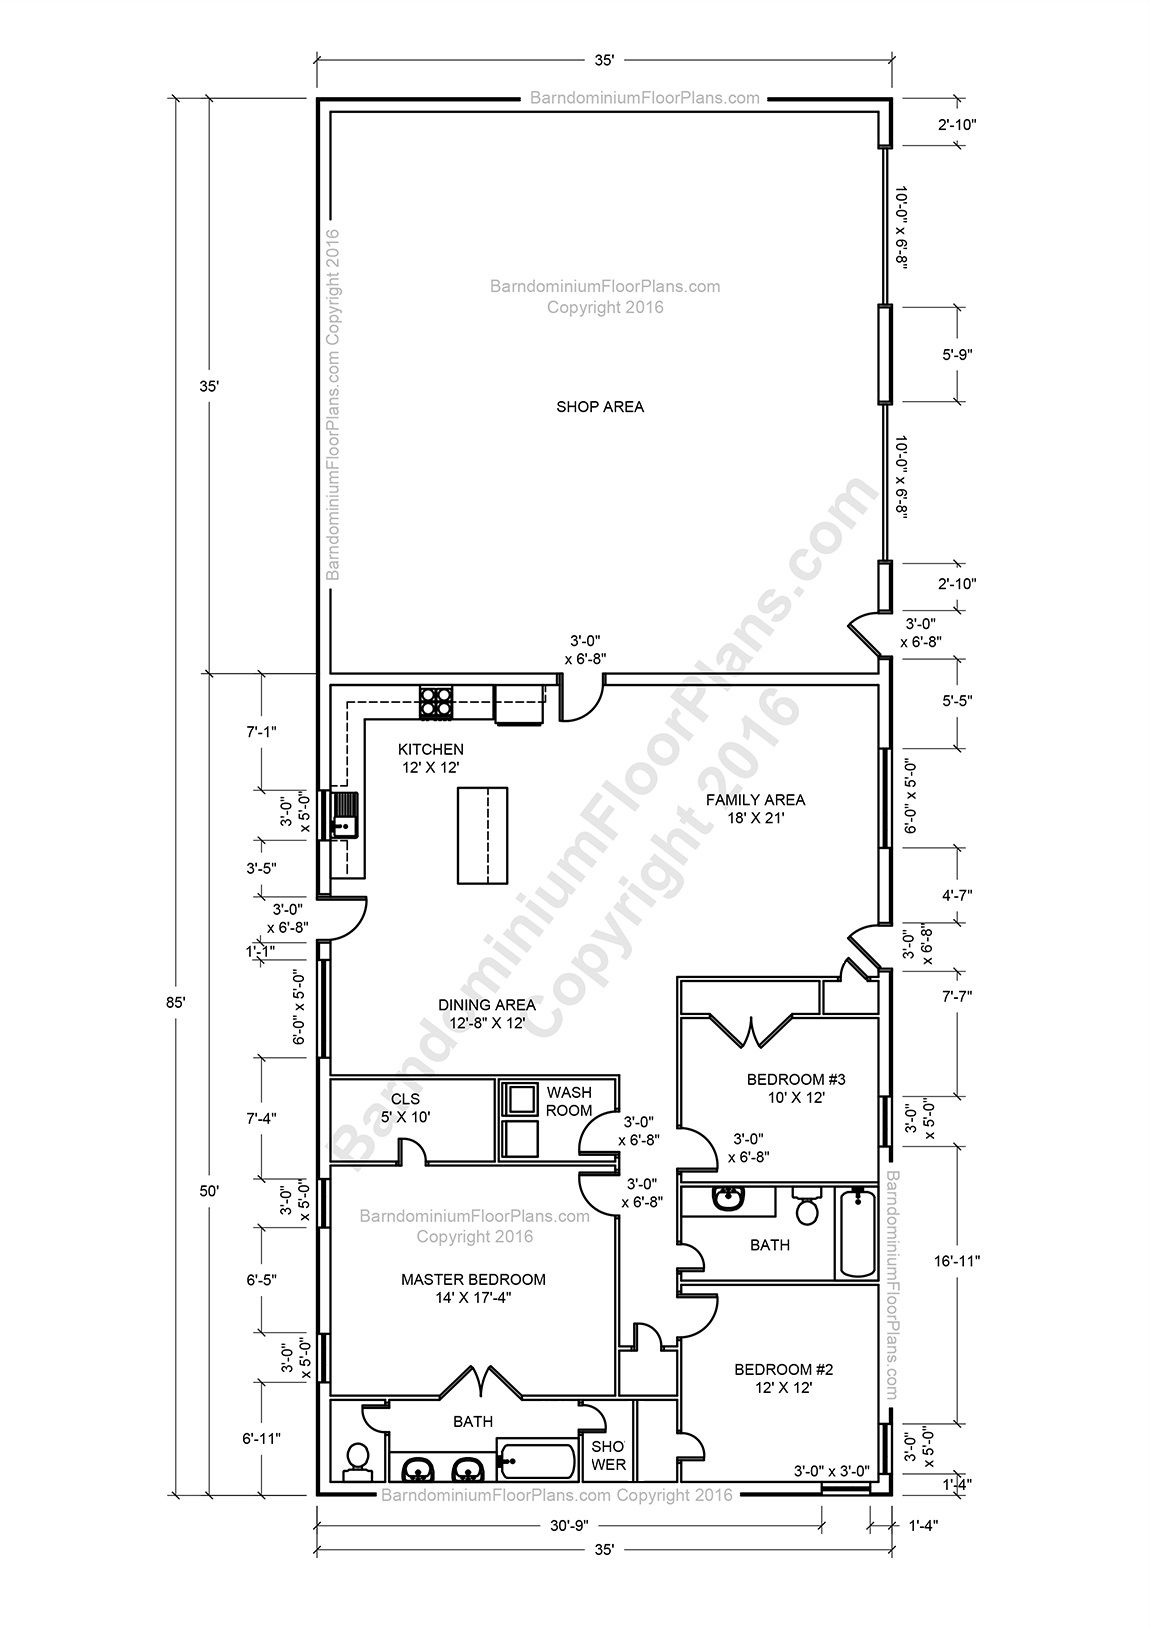 barndominium floor plans, pole barn house plans and metal barn